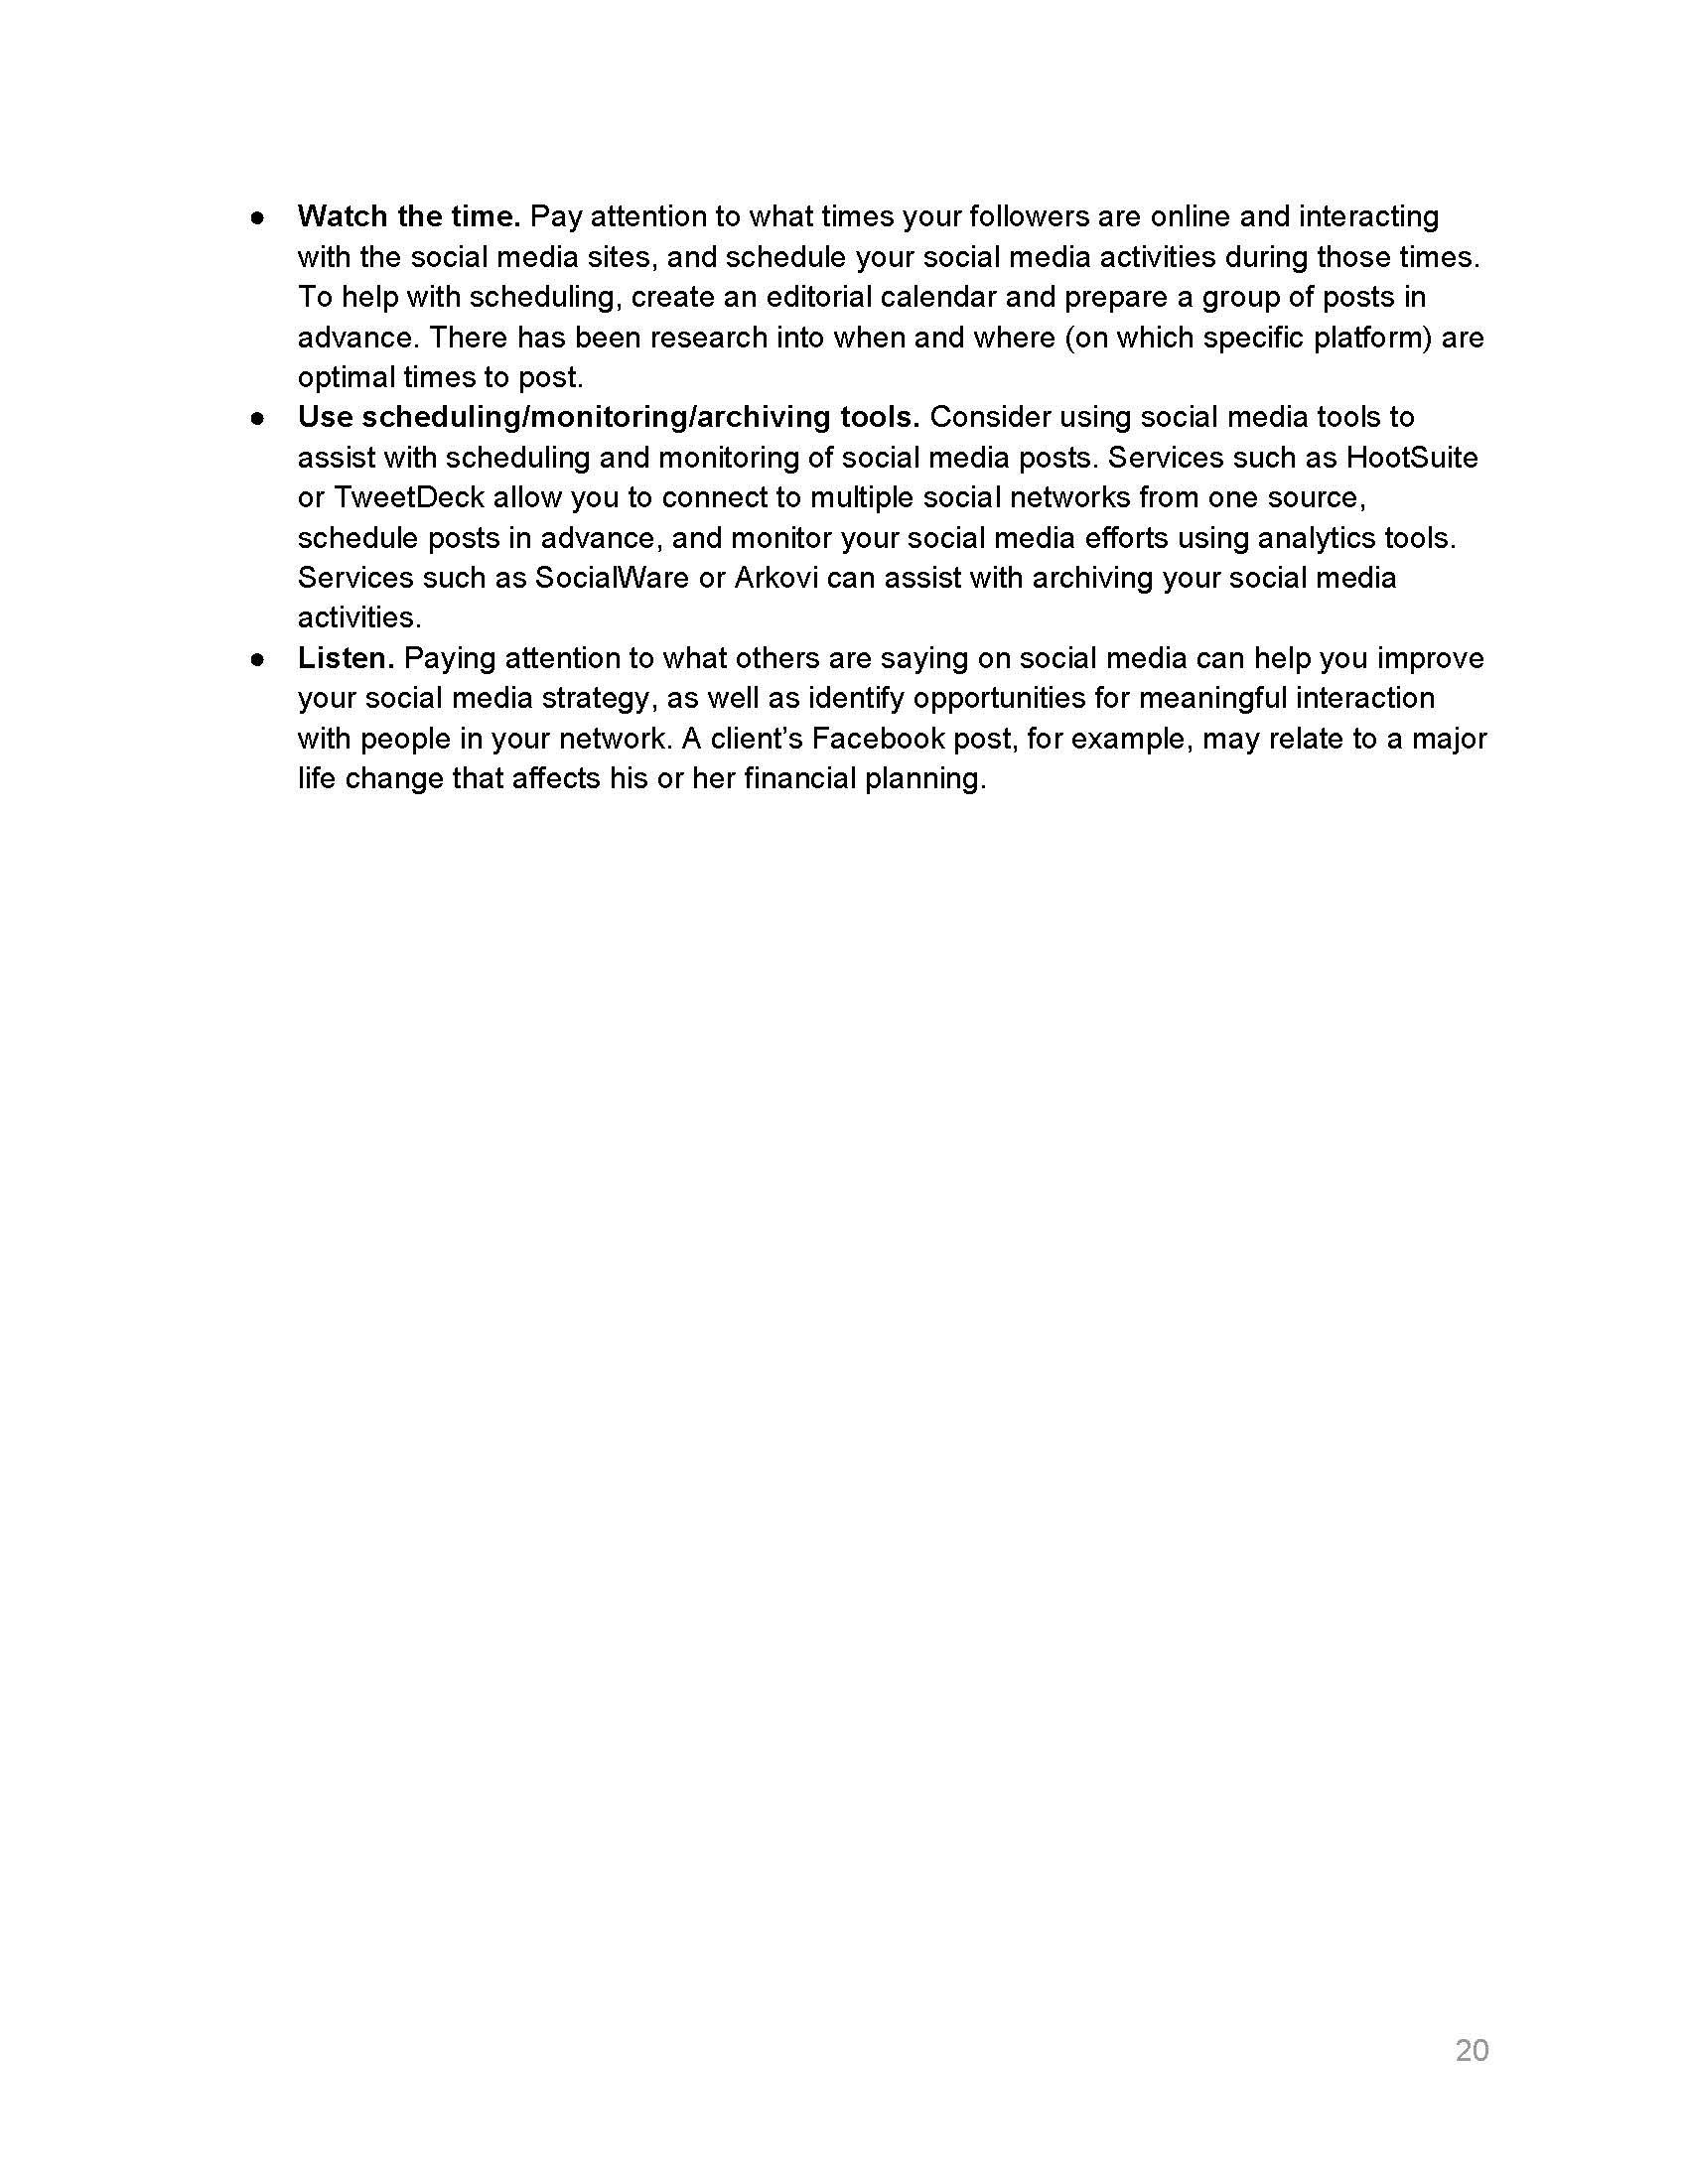 Amity Financial - Social Media White Paper_Page_21.jpg